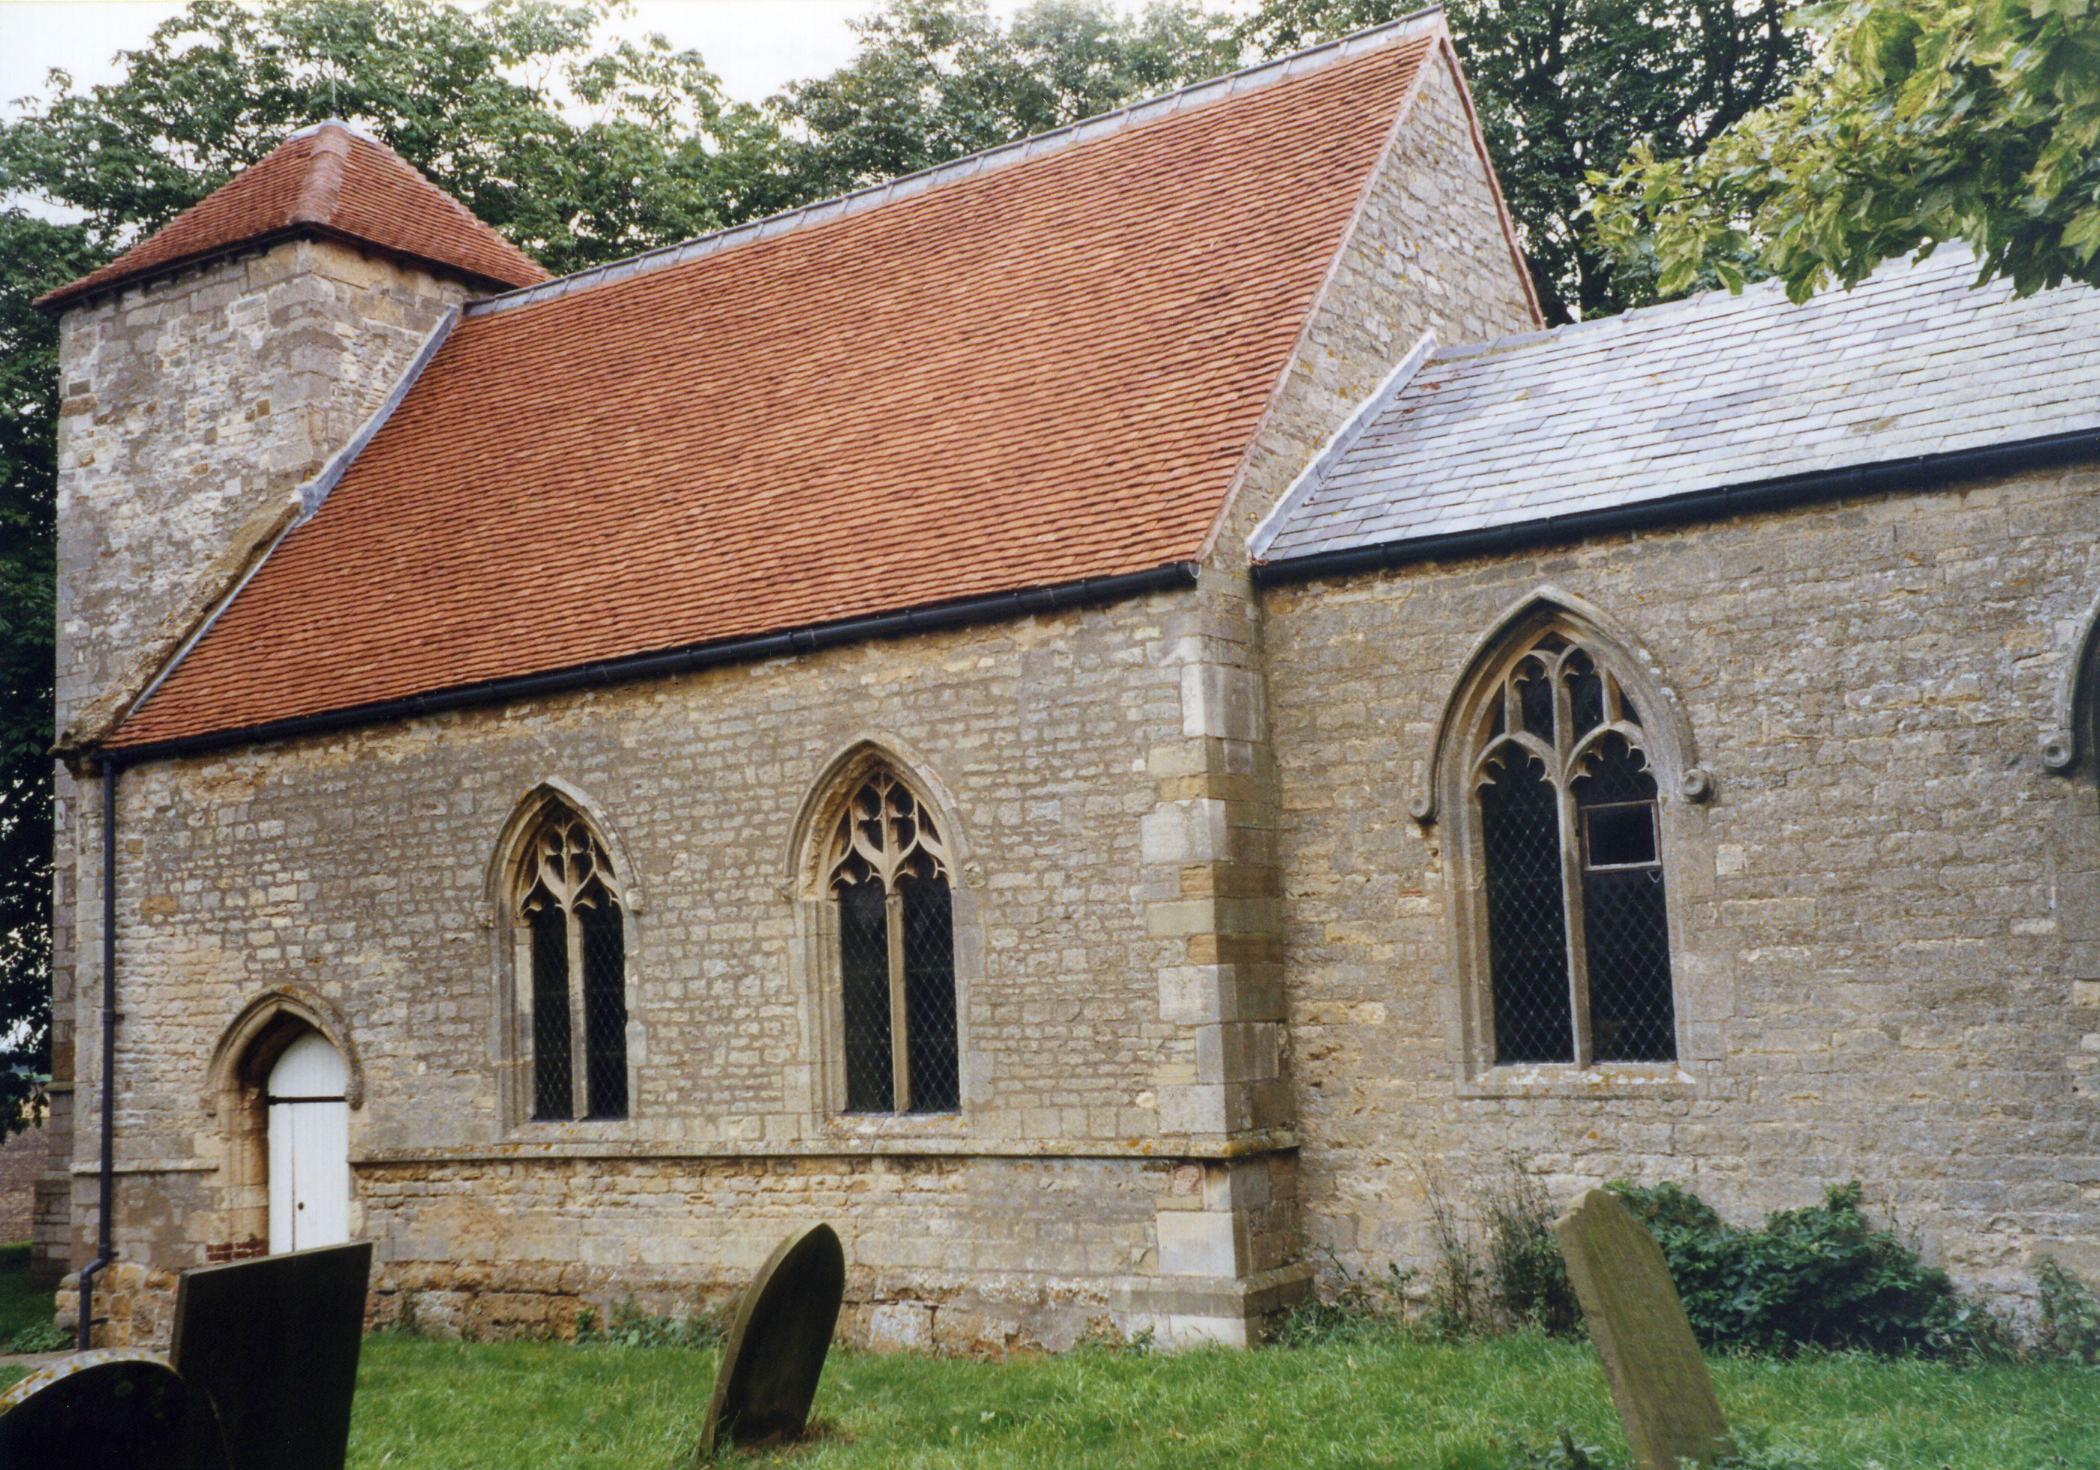 St. Lawrence parish church